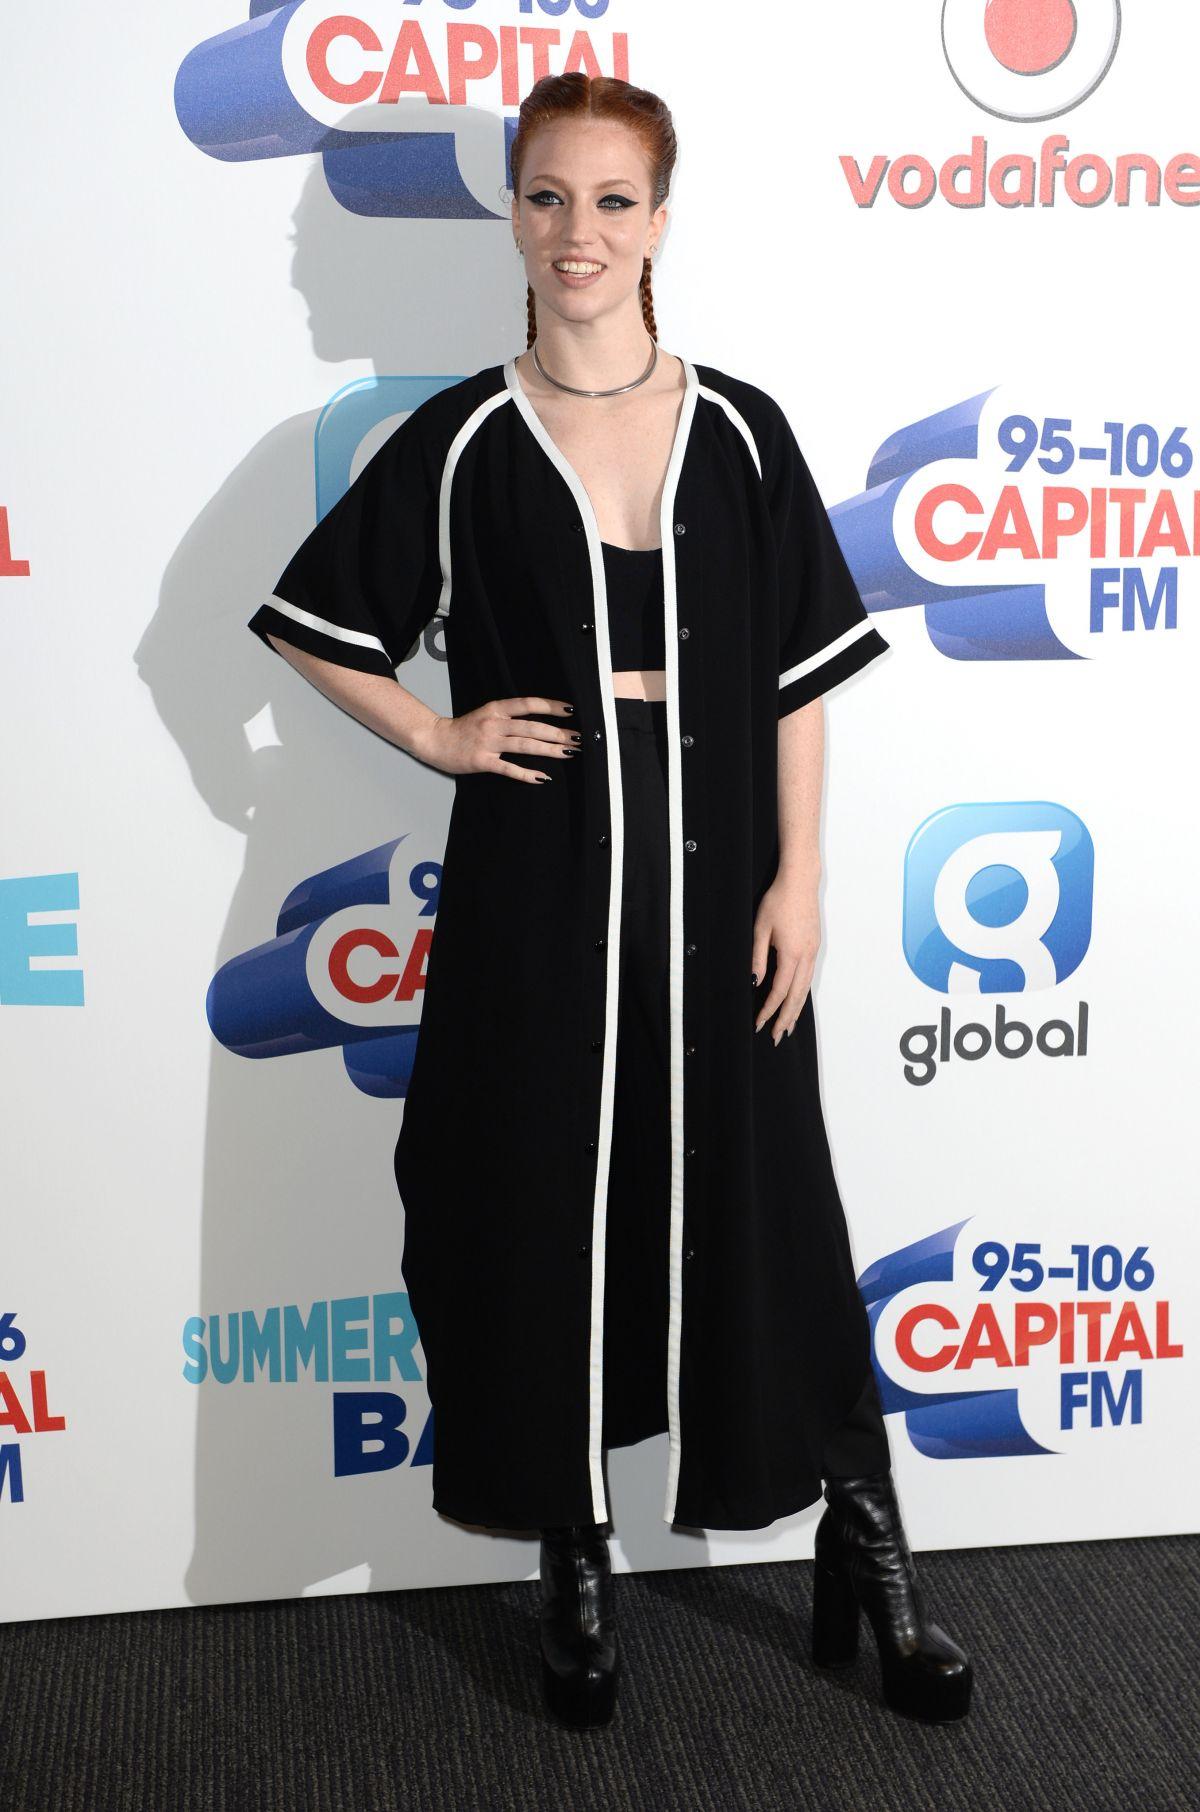 JESS GLYNE at Capital FM Summertime Ball in London 06/11/2016